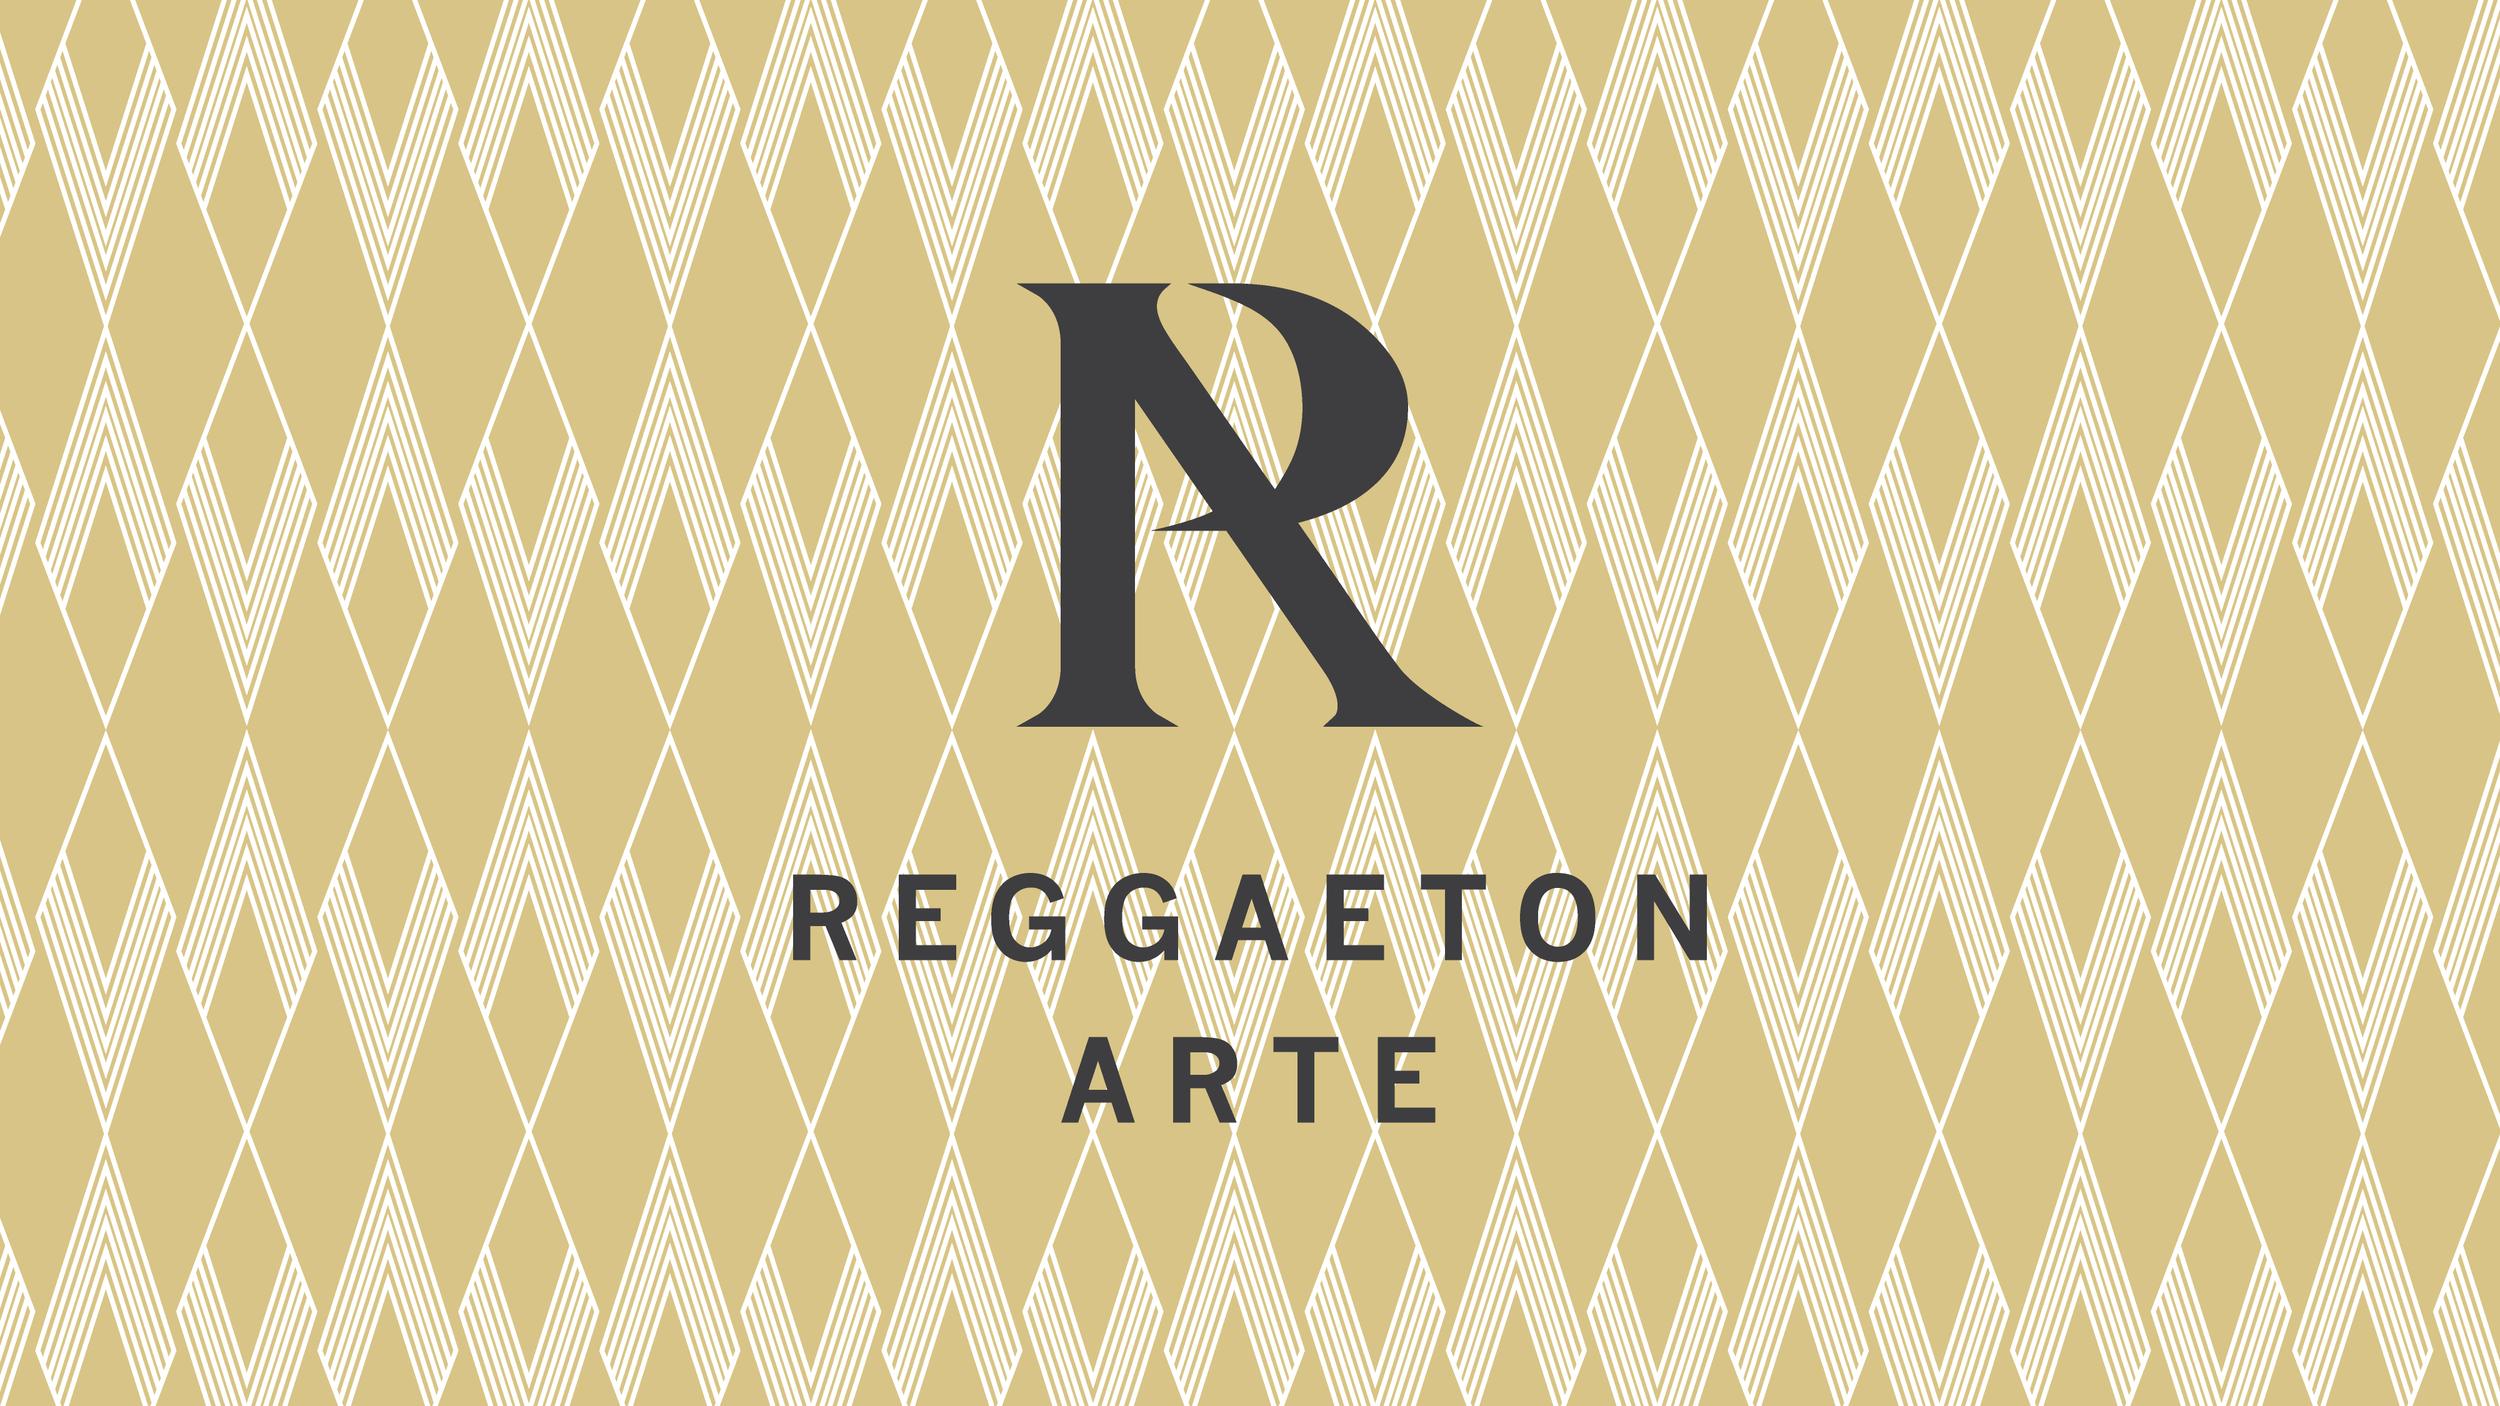 Reggaetonarte HD-38.png